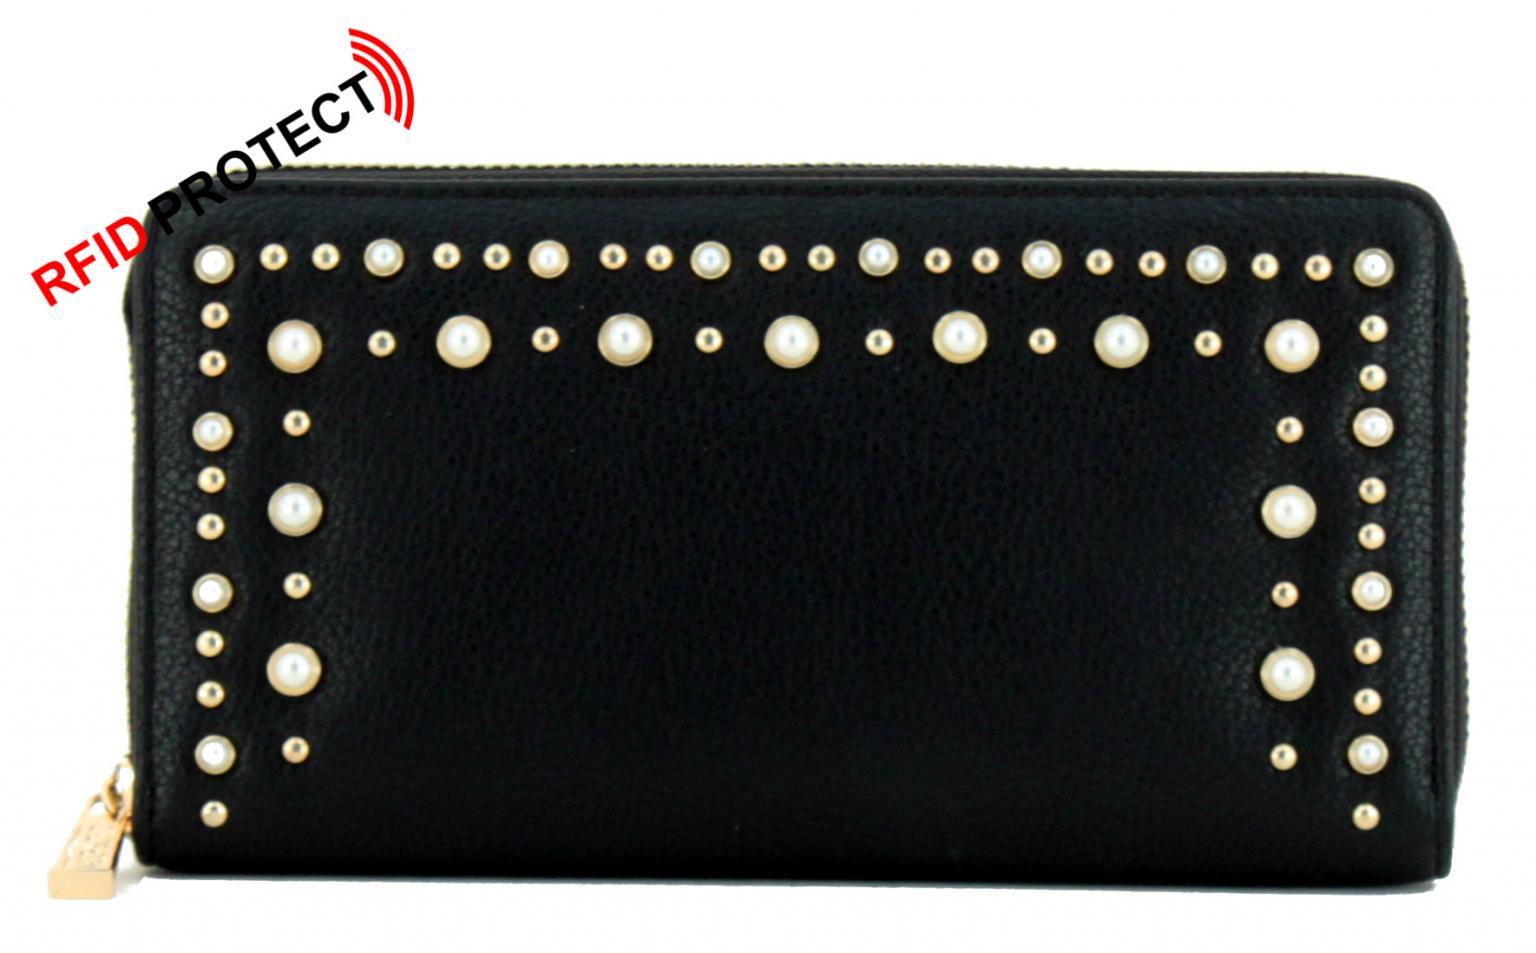 477357d7bfa14 Damenportemonnaie L.Credi Munich Bian schwarz Perlen Nieten - Bags ...